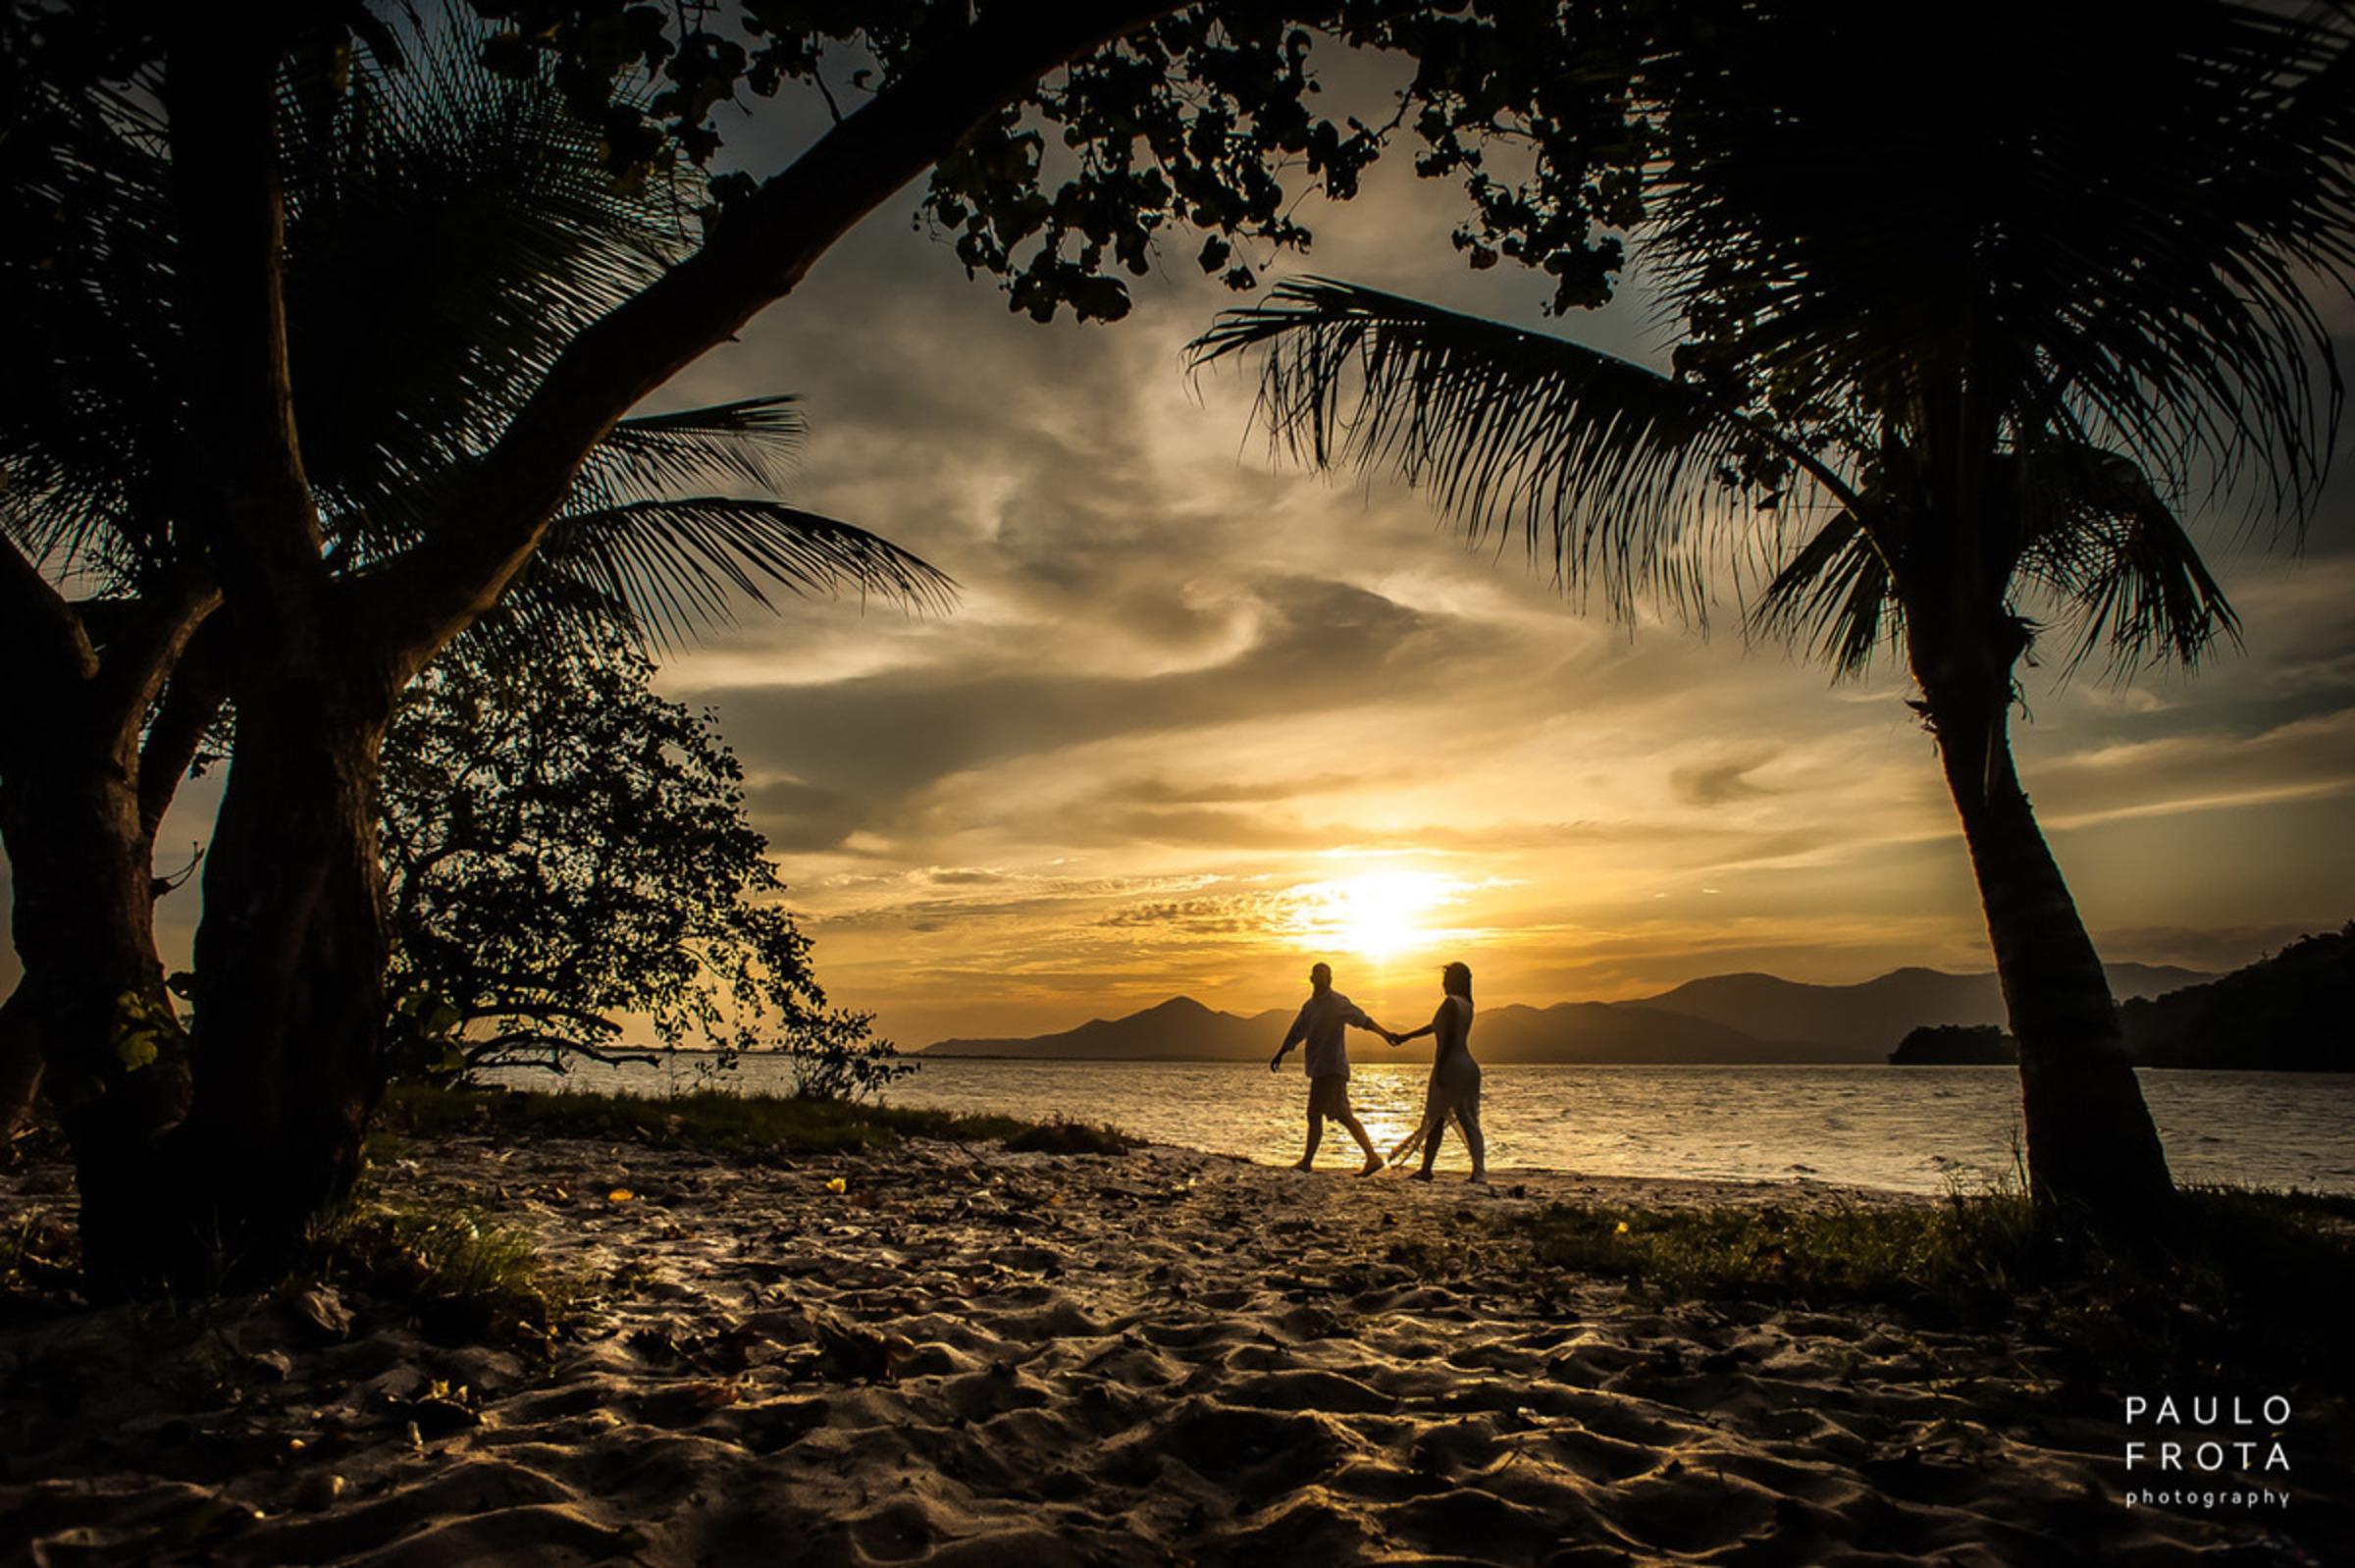 Contate Fotógrafo de Casamento e Ensaio de casal - Niterói - RJ, Paulo Frota